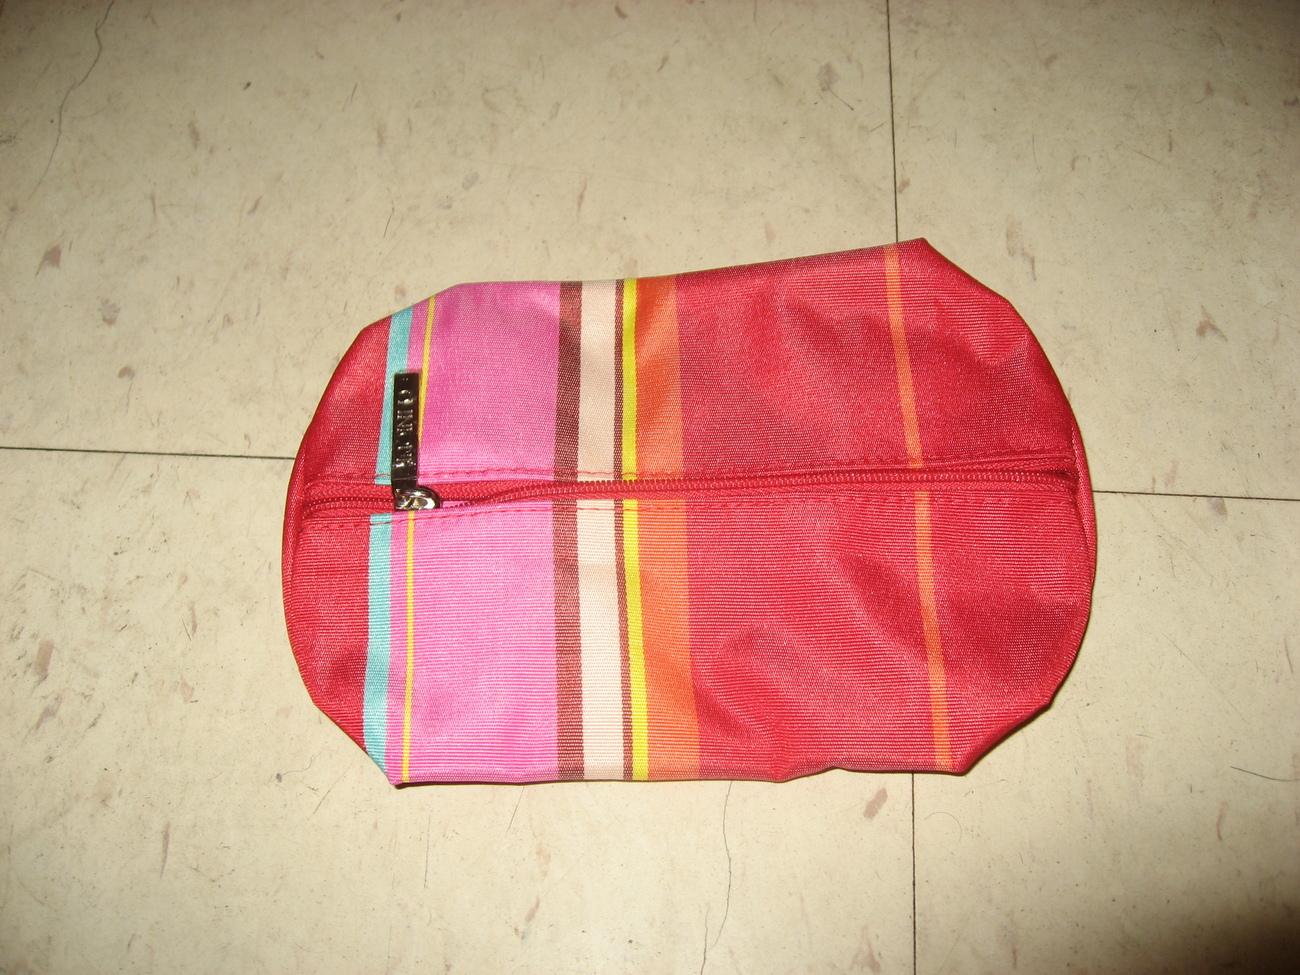 Clinique red striped makeup bag